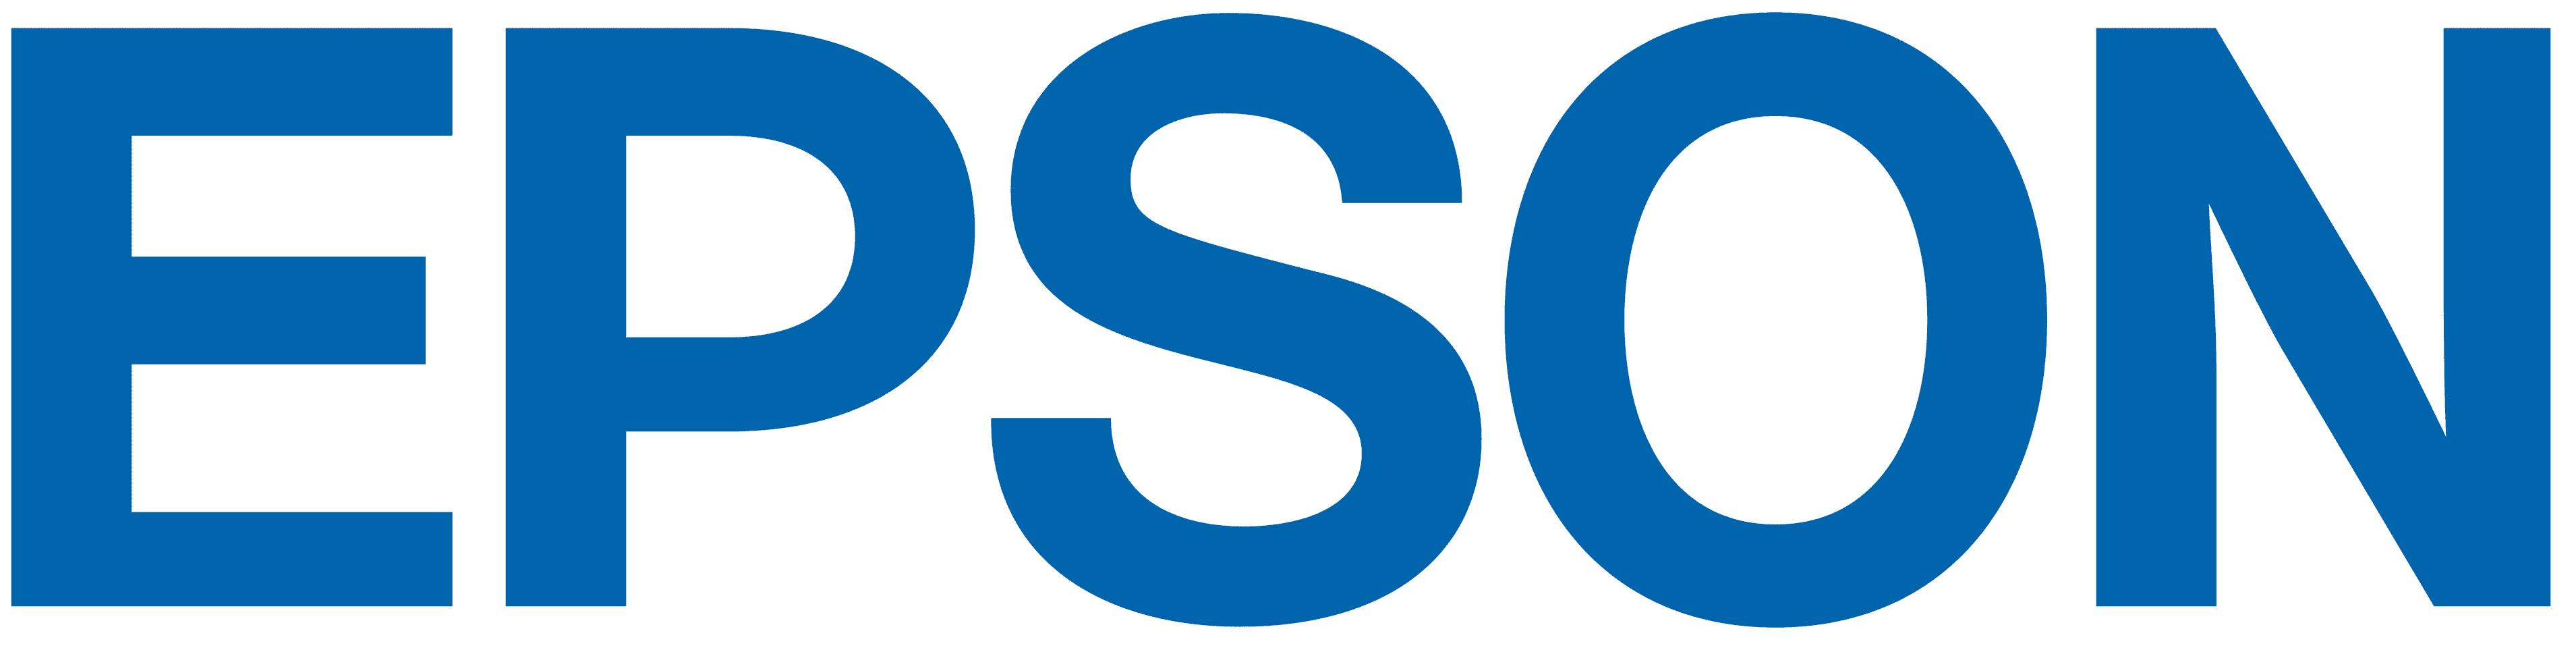 Logo EPSON integrato con mallbox rt